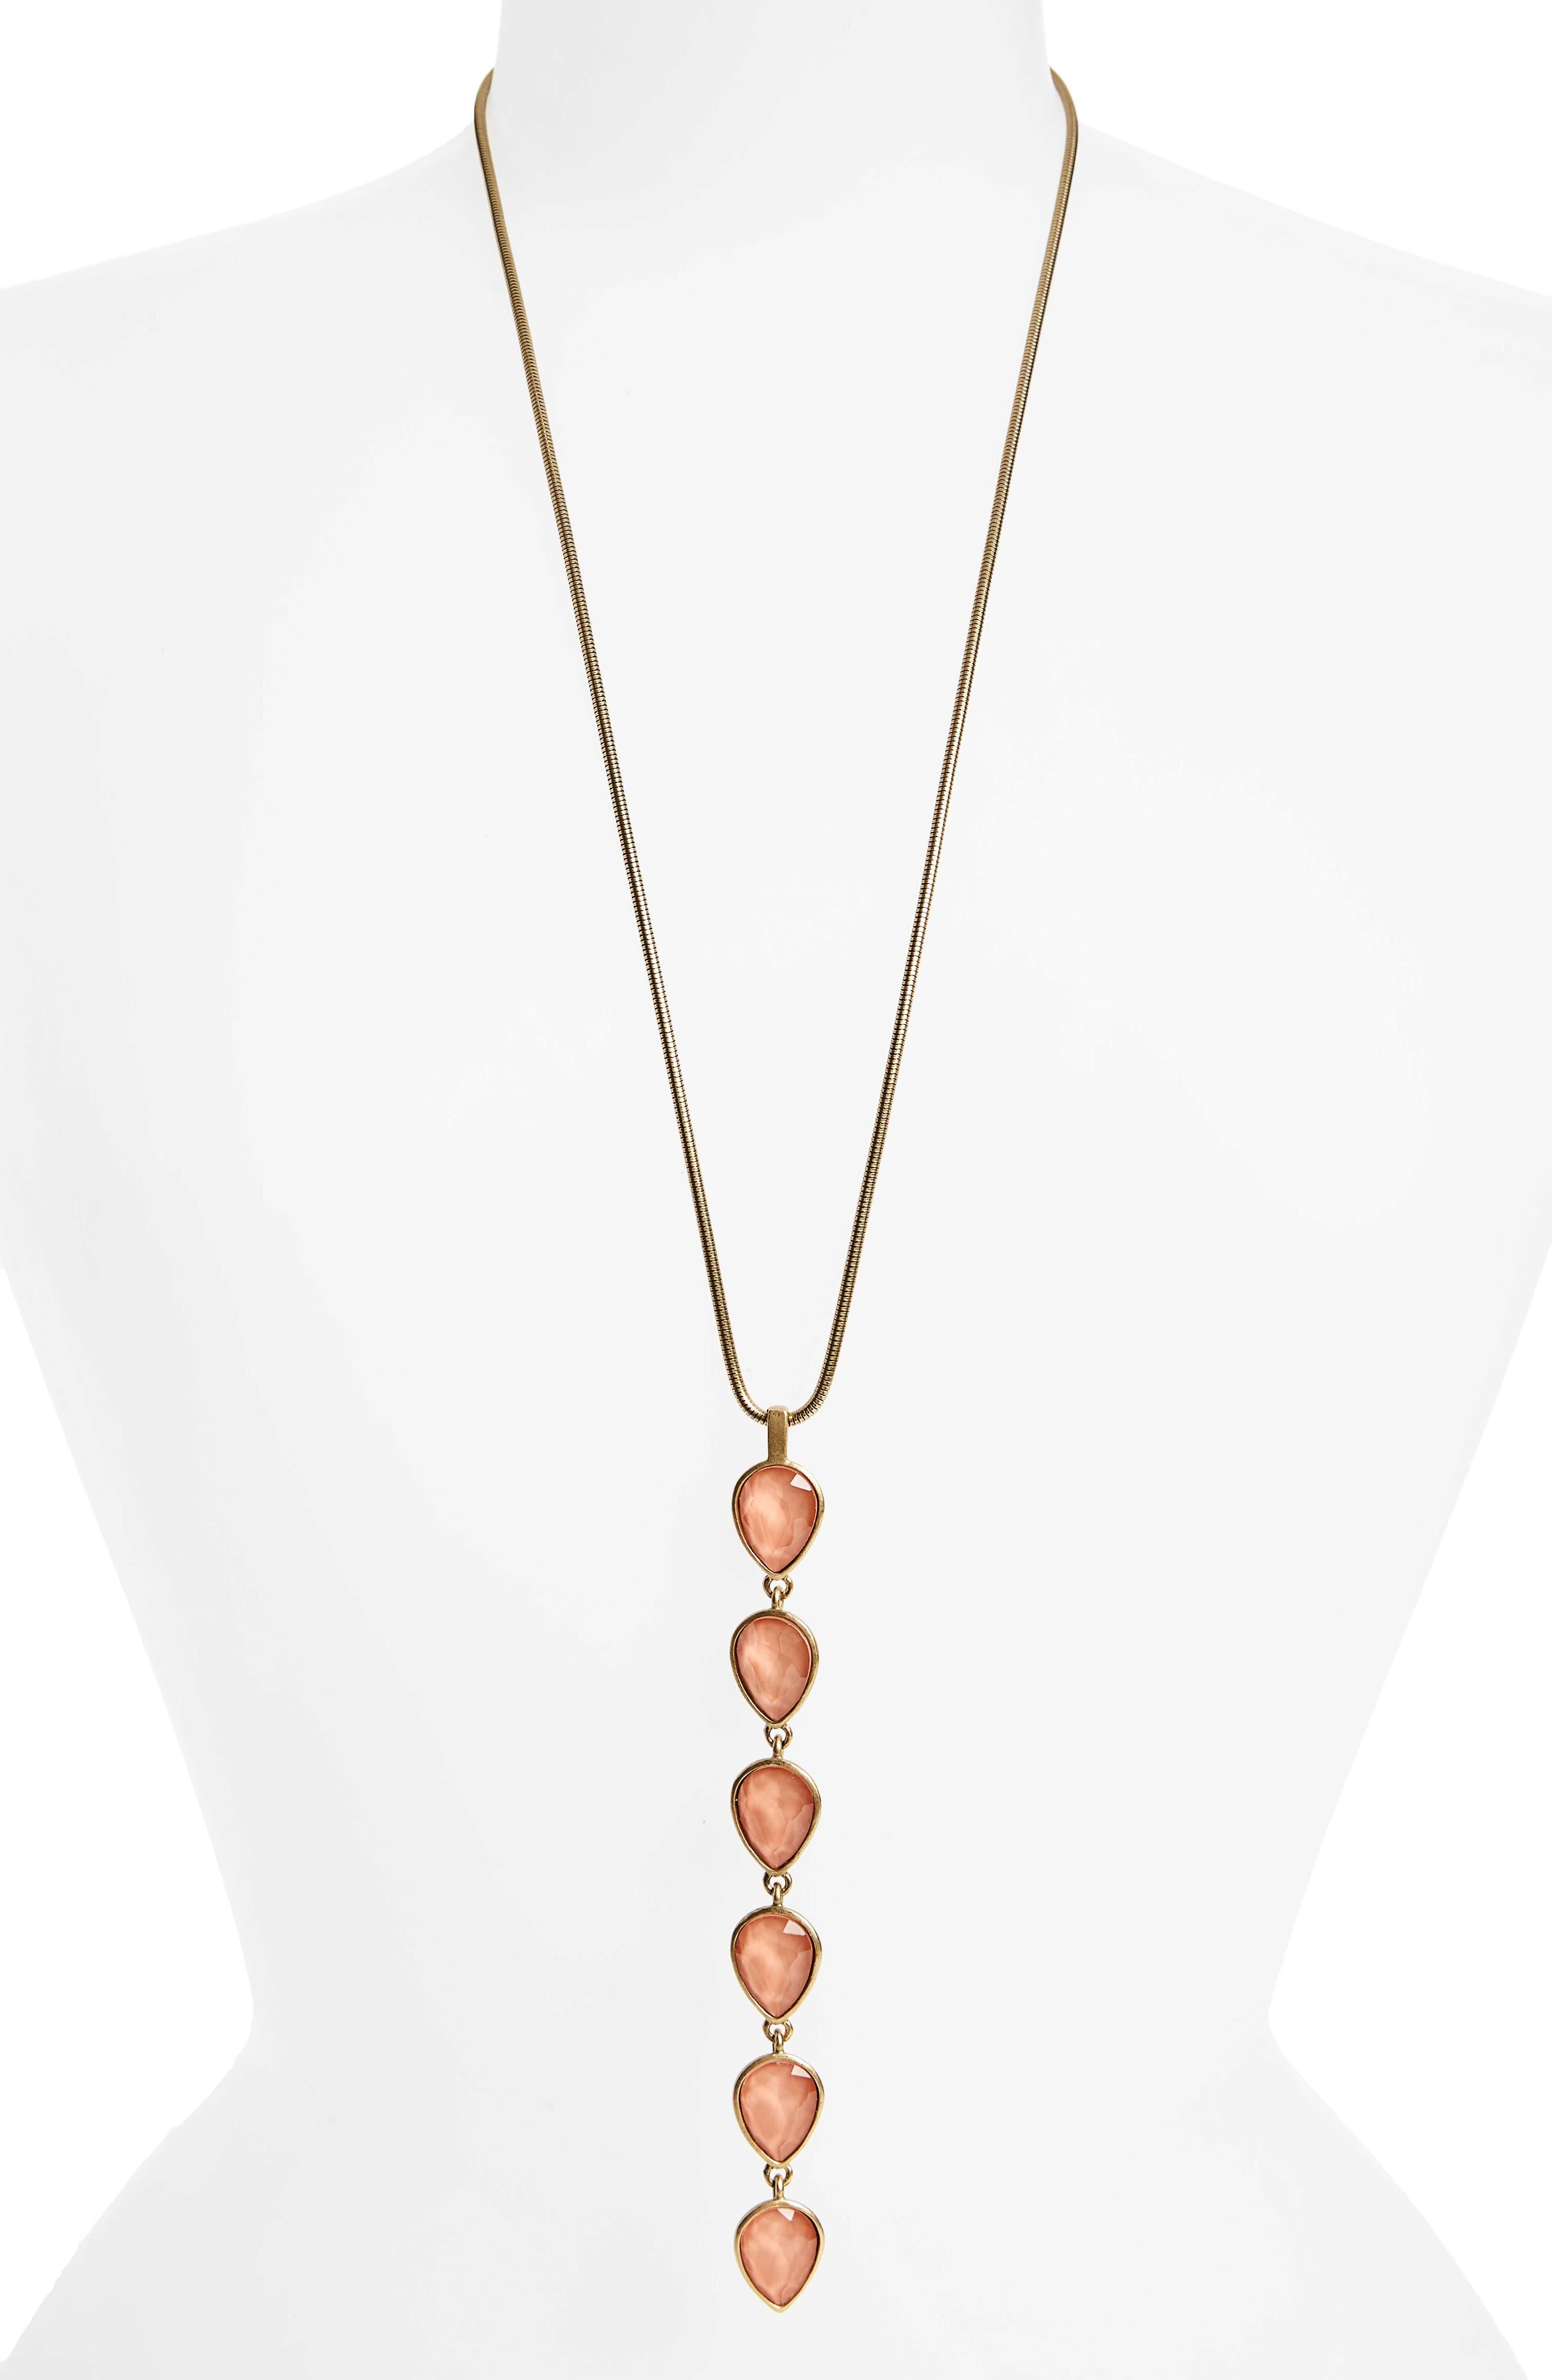 Loren Hope Sydney Pendant Necklace